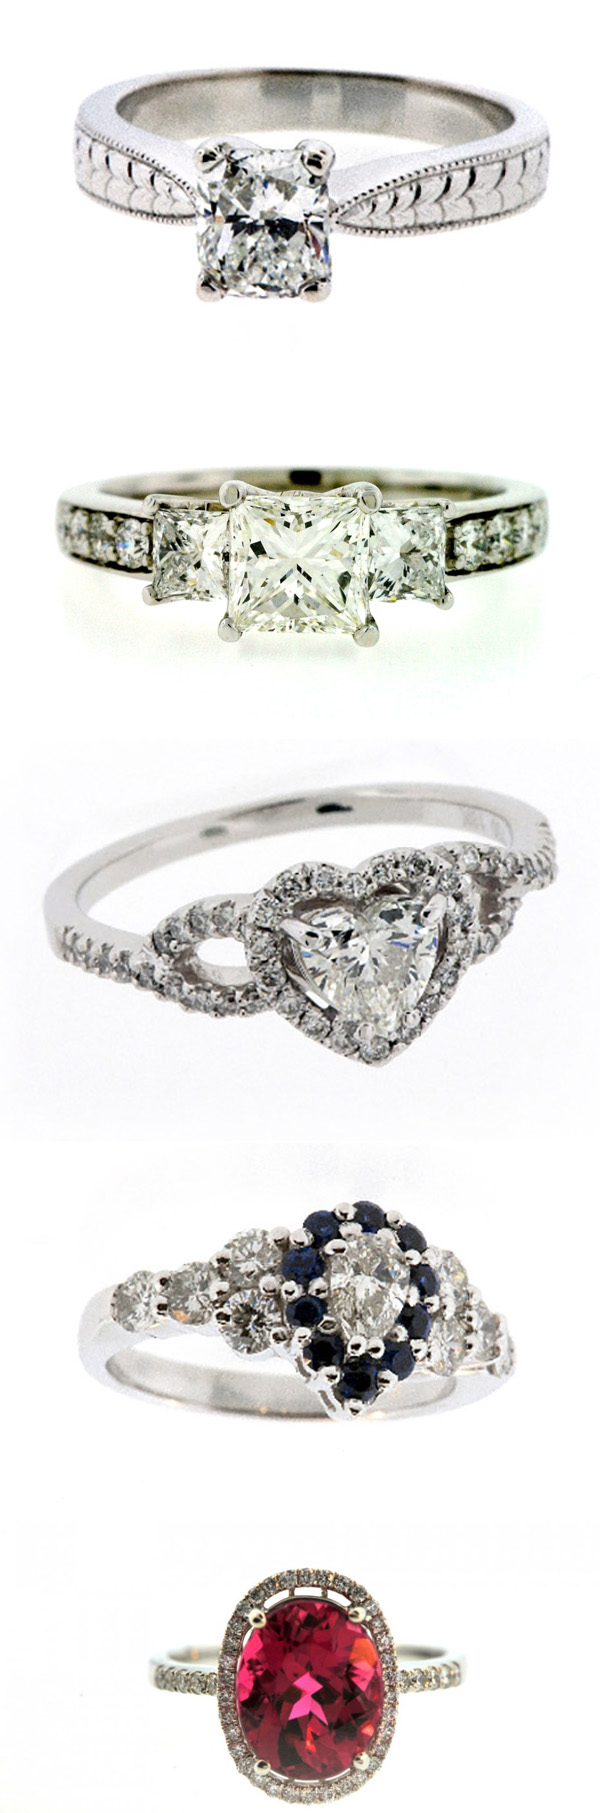 vendor spotlight kneucraft fine jewelry and design